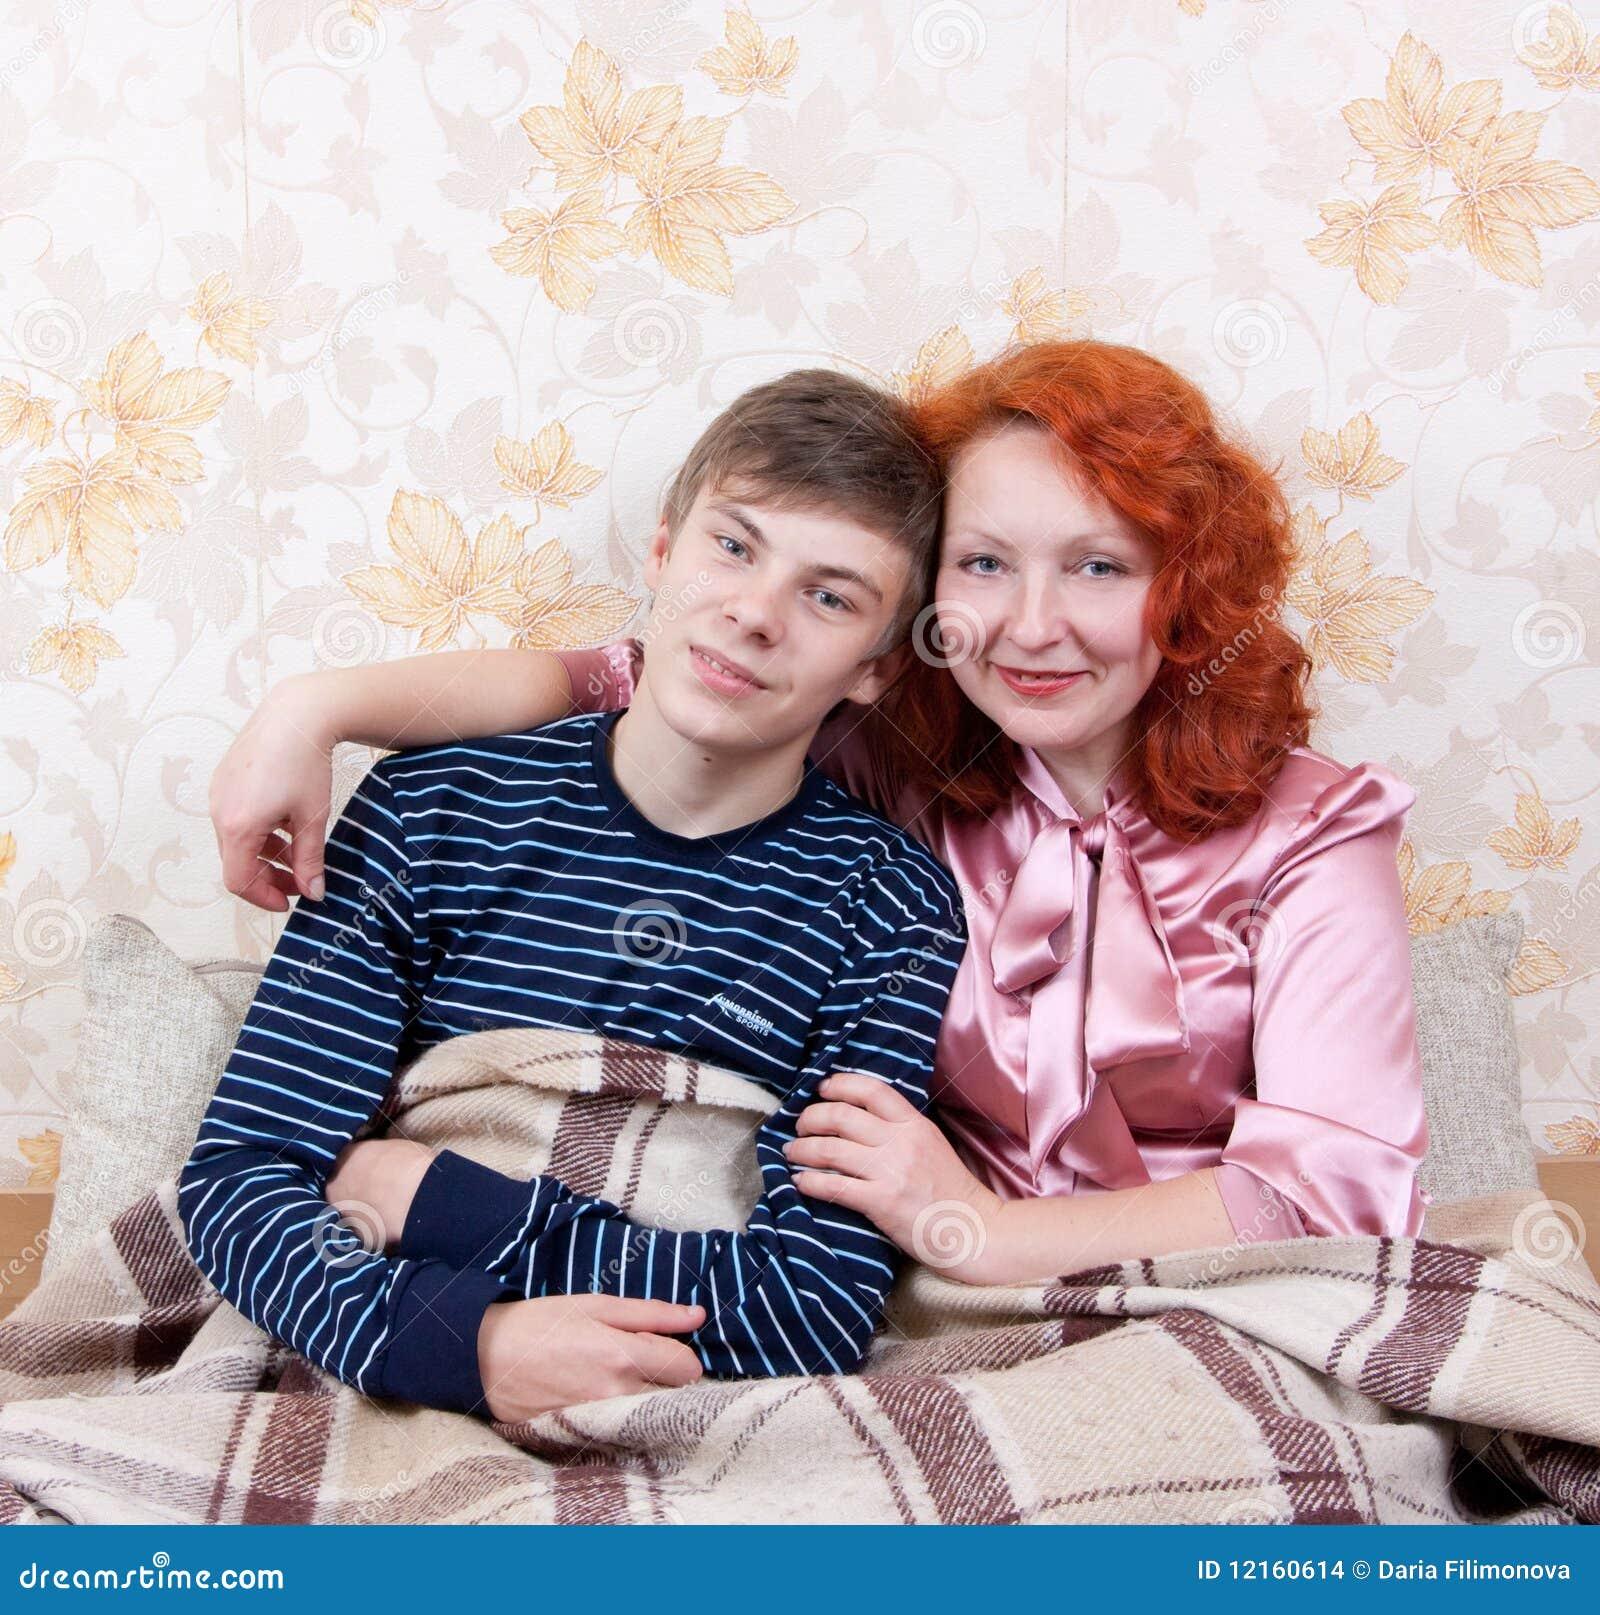 Сын снял маму 16 фотография